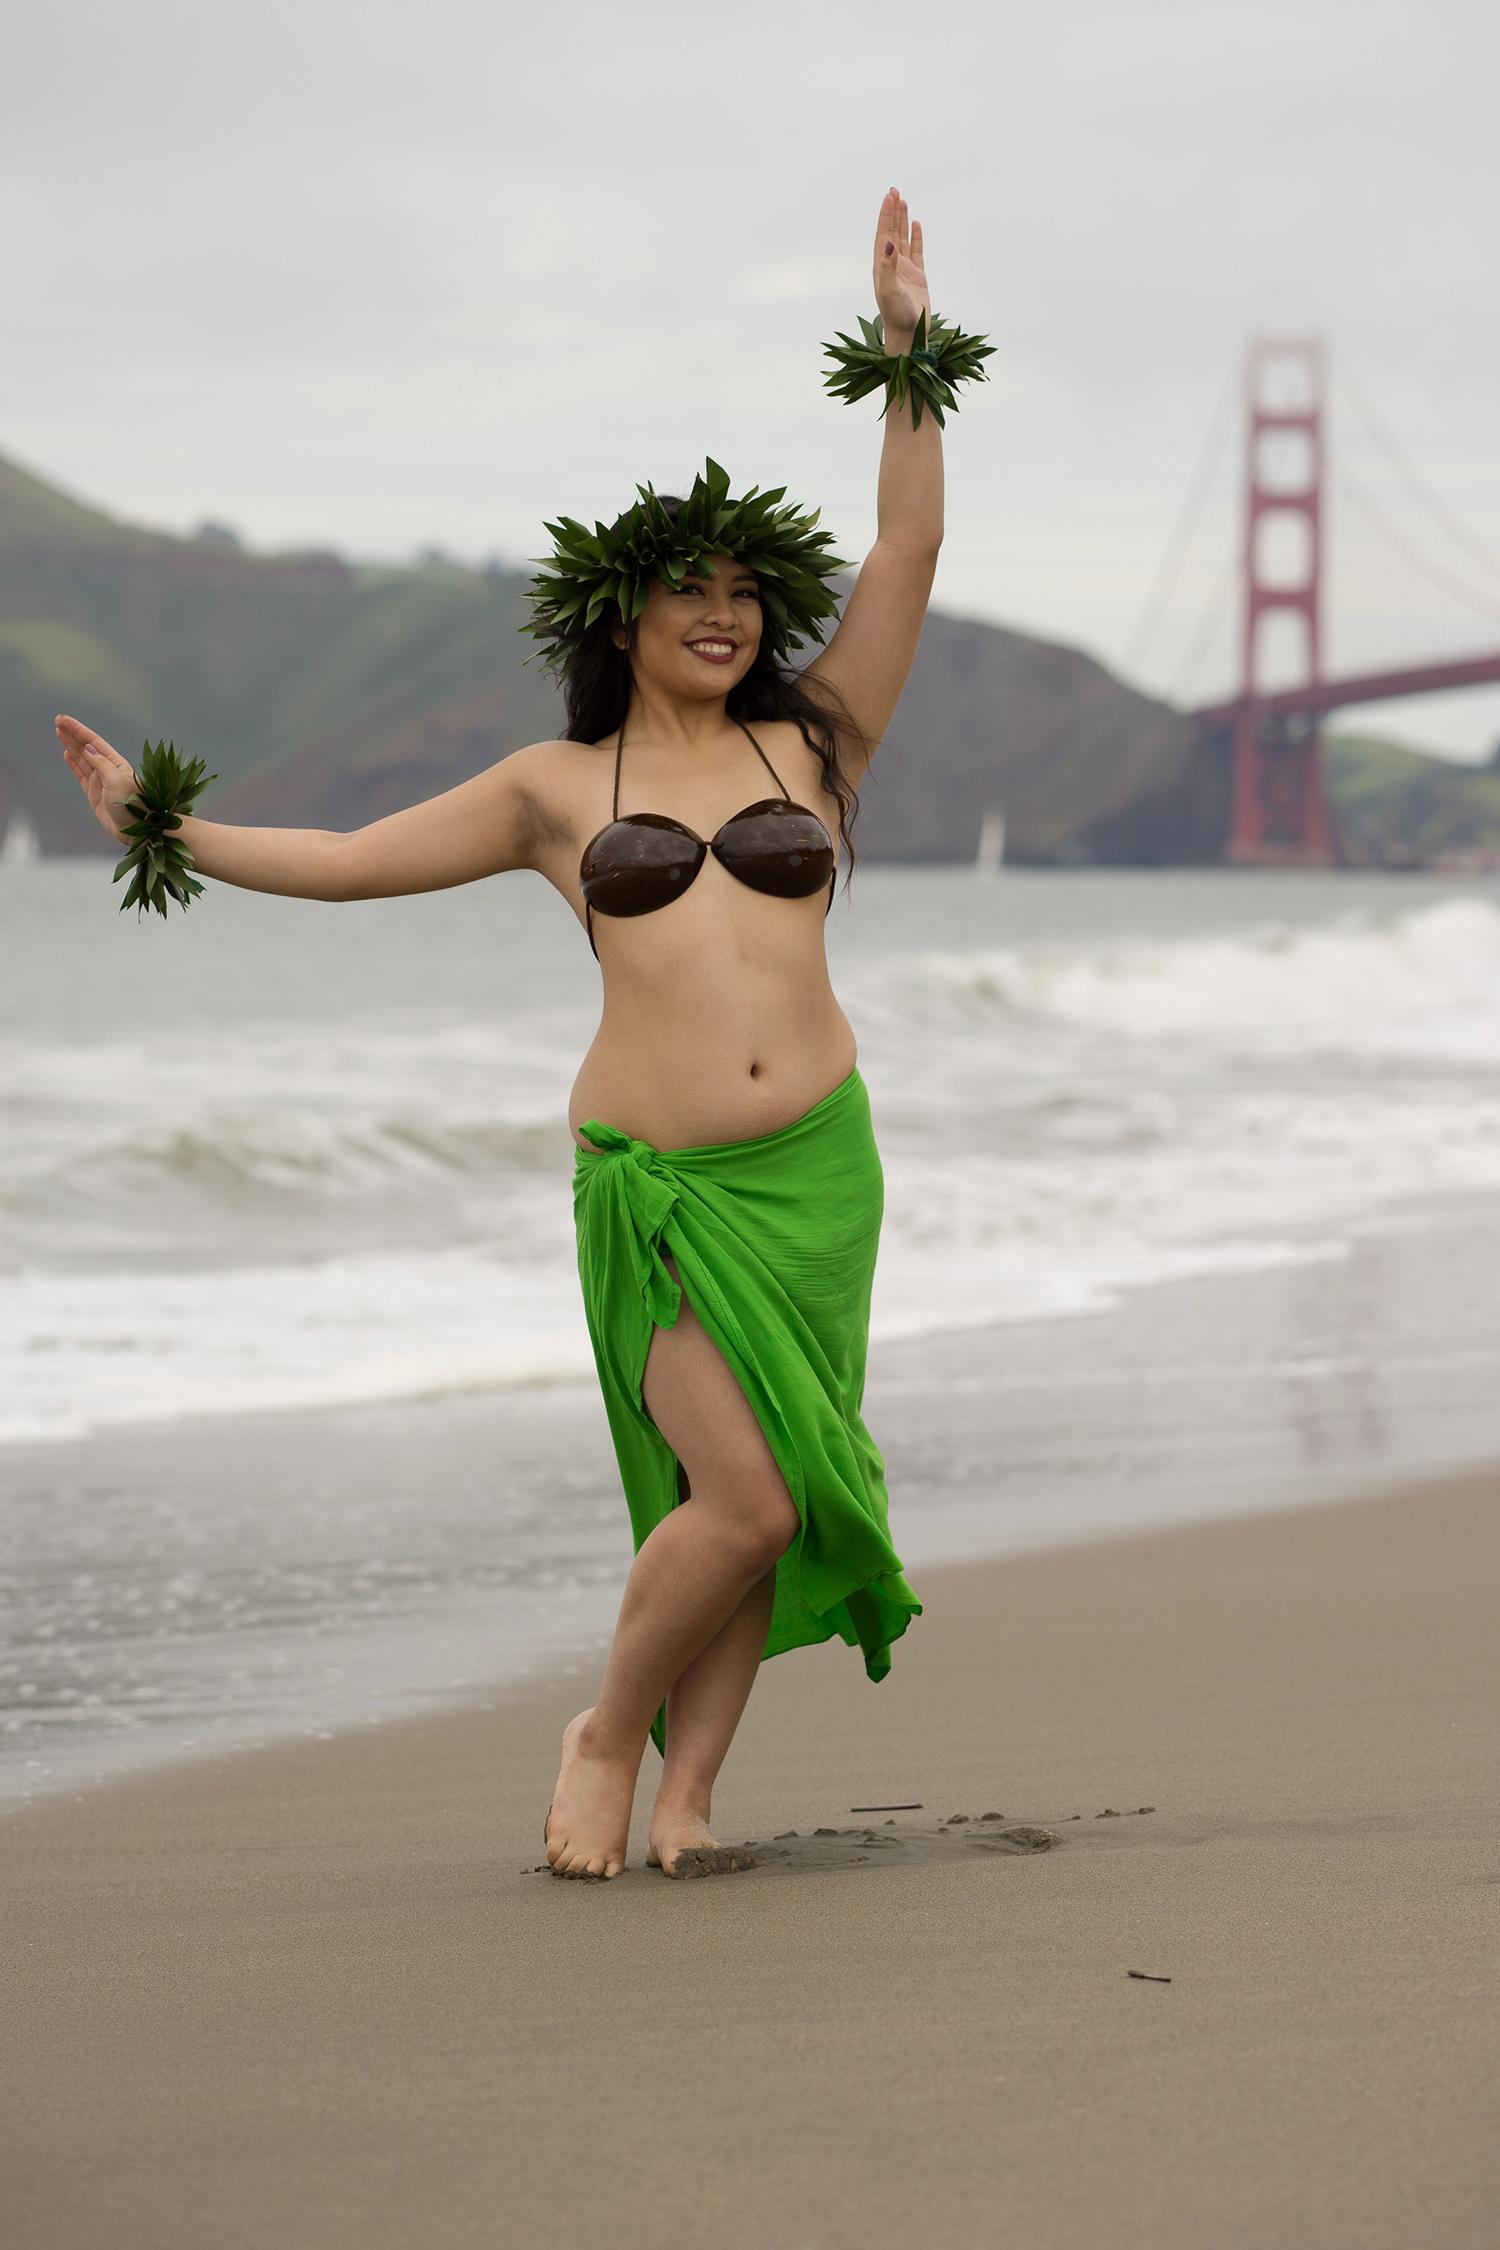 Manuia-Polynesian-Revue-Portrait-Luxchromatic-Photography-Hula-Dance-San-Francisco-Bay-Area-Sony-Alpha-A7Rii-Zeiss-Lens-Profoto-B1-B2-Wescott-Aloha-SonyAlpha-1123.jpg